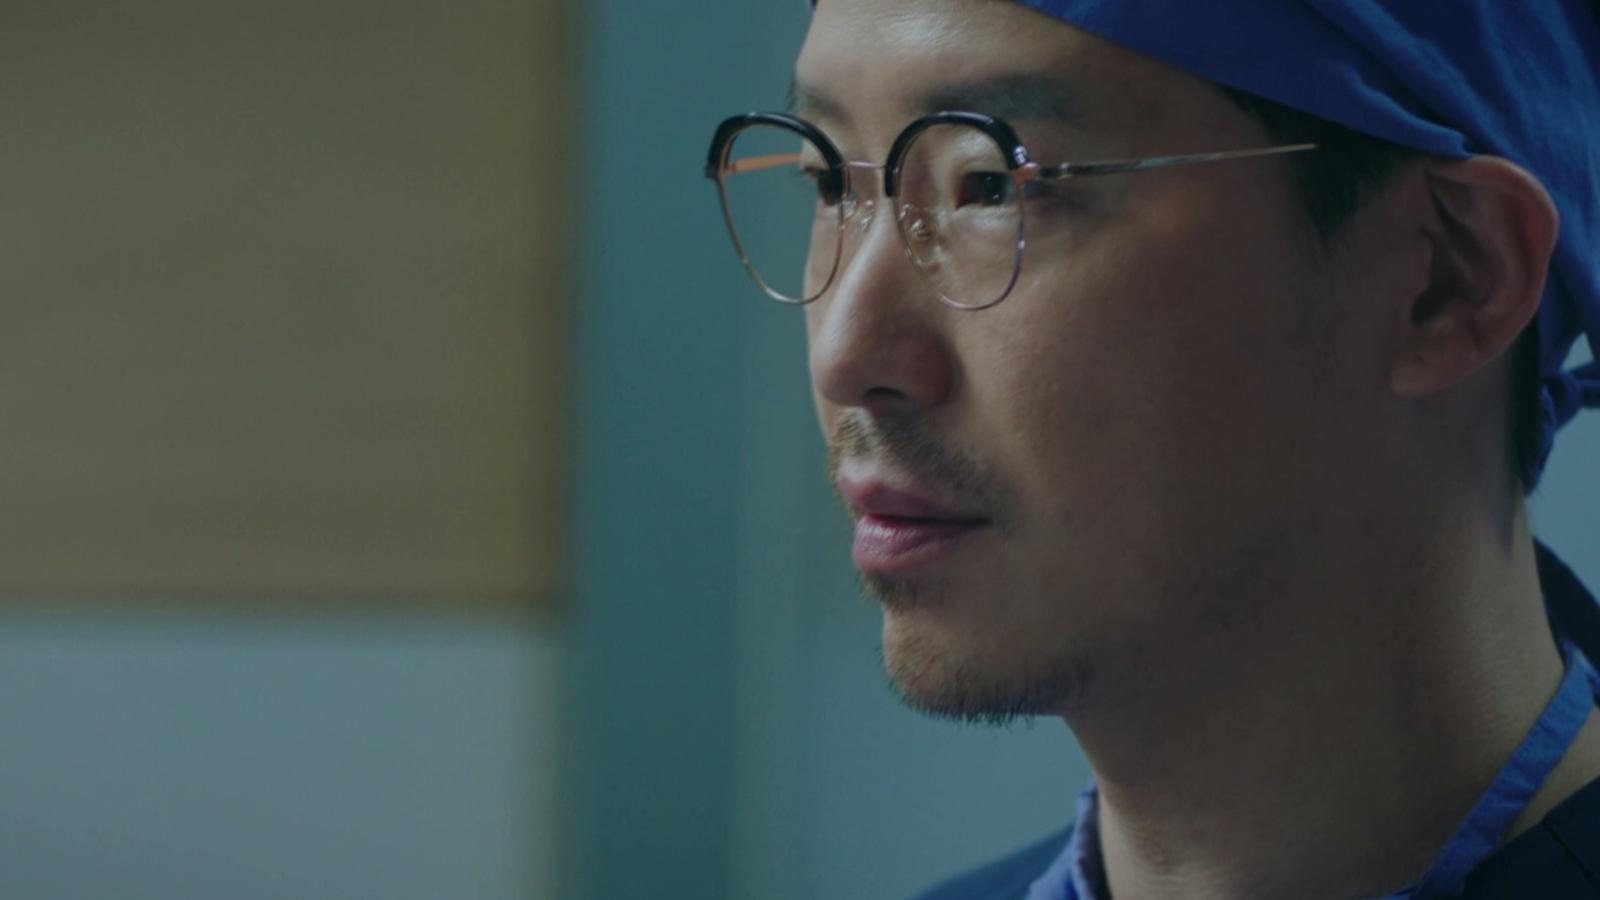 Trailer 3: Heart Surgeons